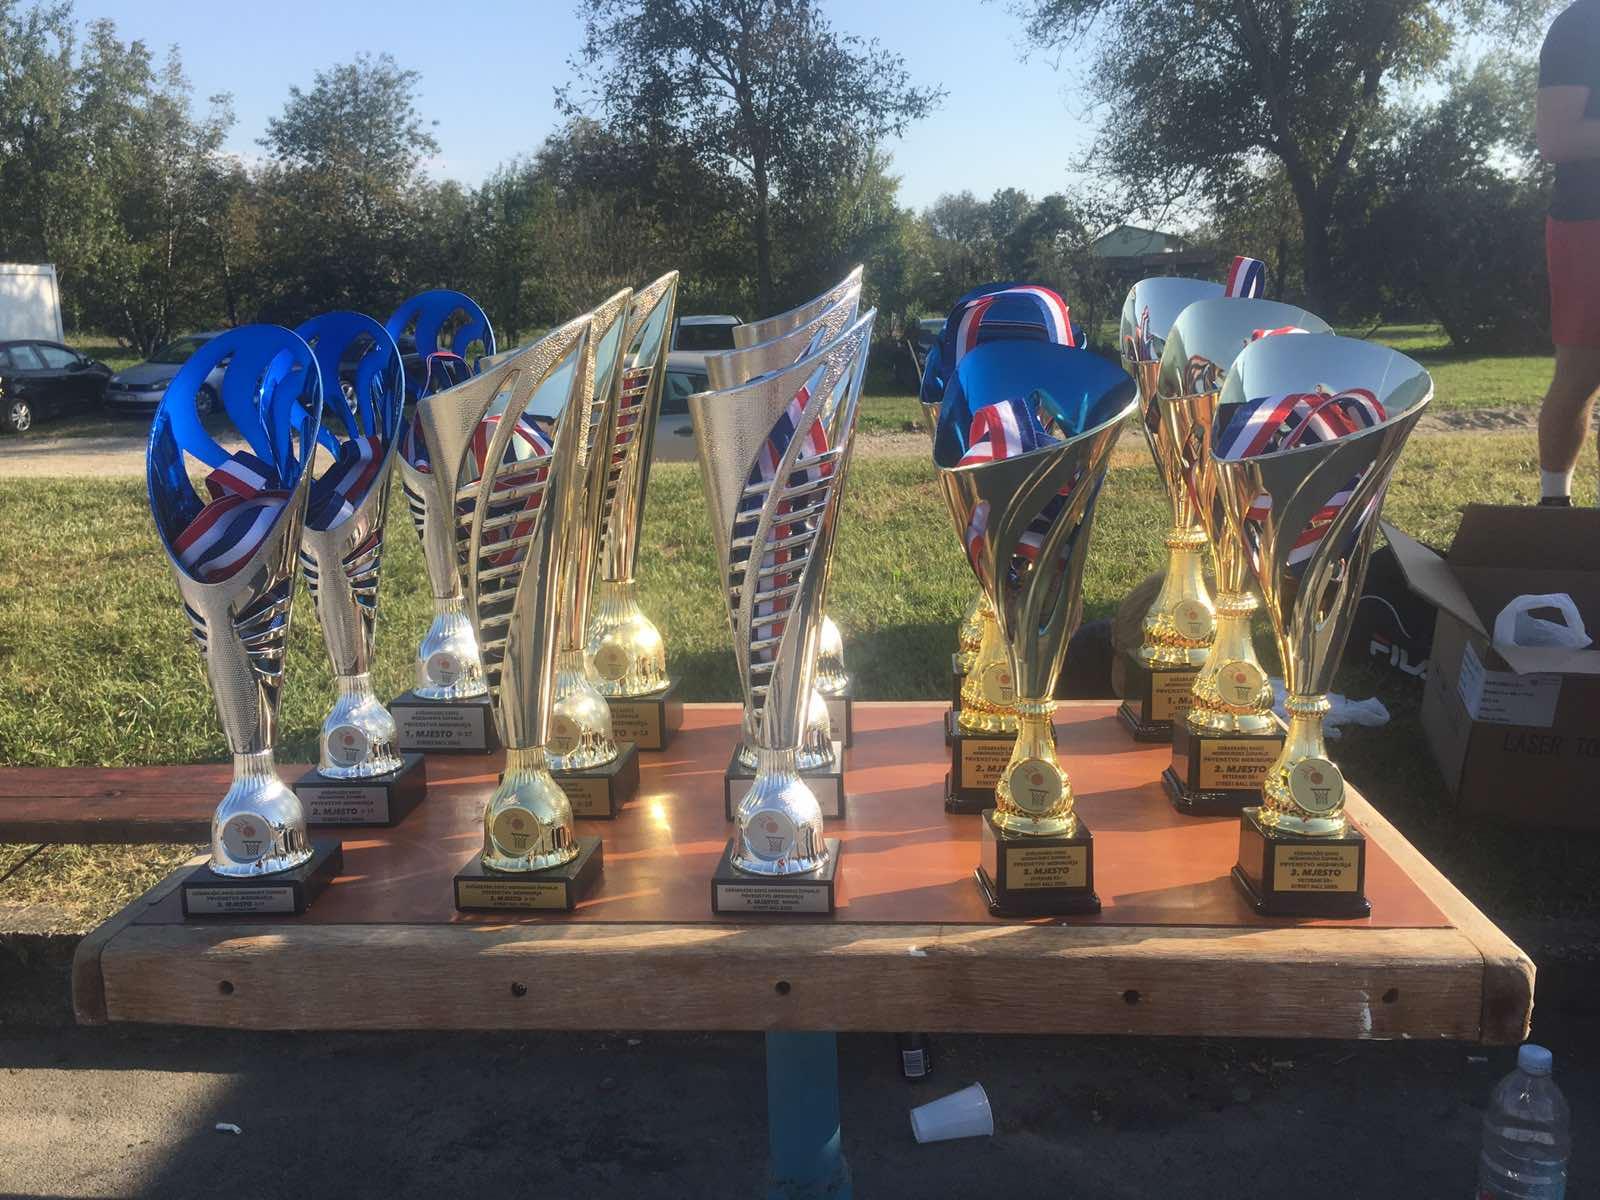 1. prvenstvo Međimurja u streetball-u 2